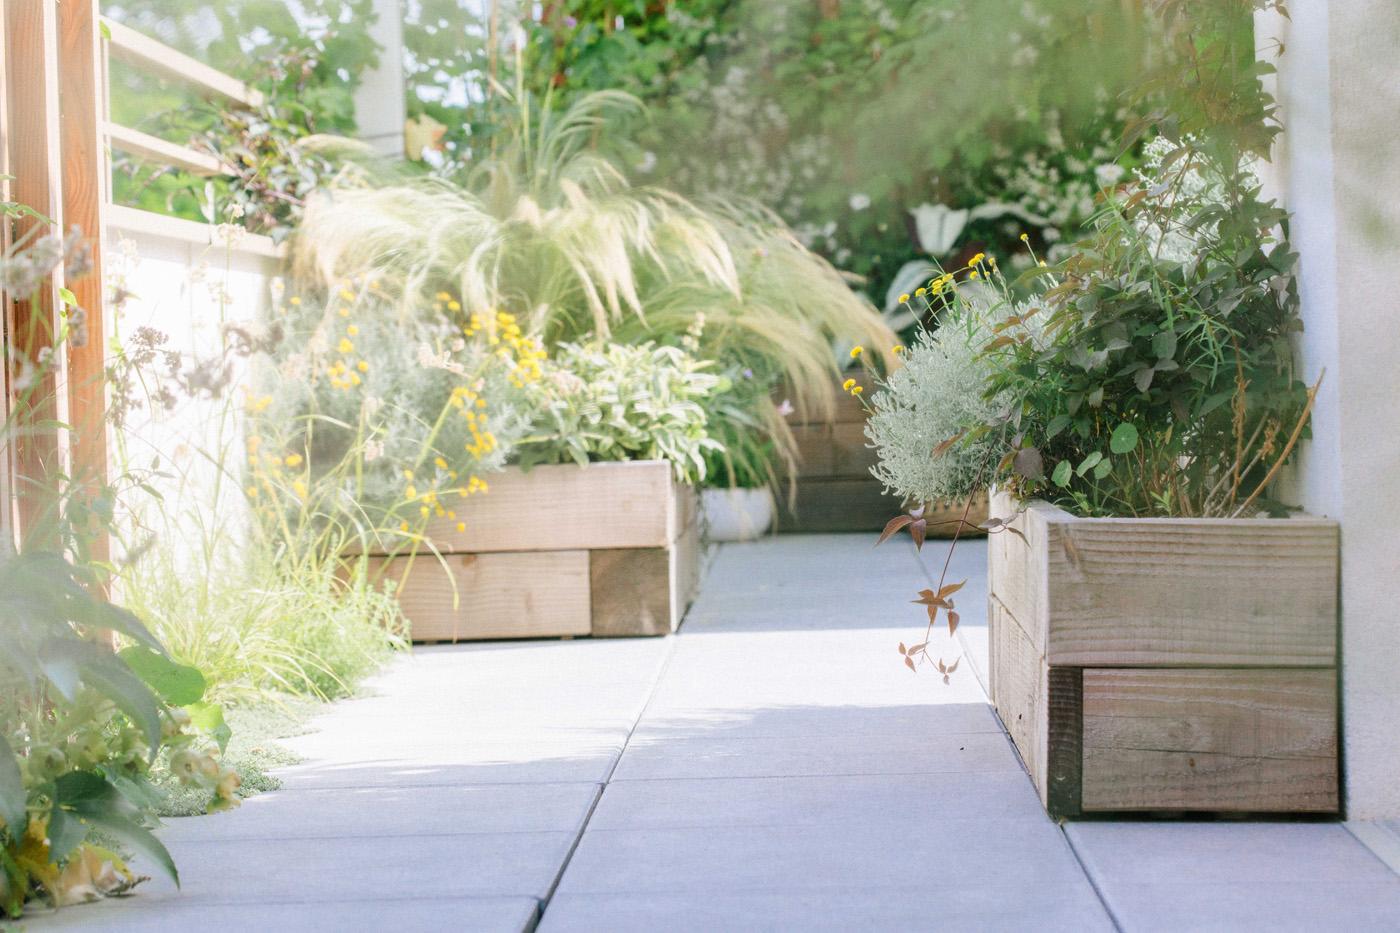 60-Lili Garden Terrasse Romainville Details